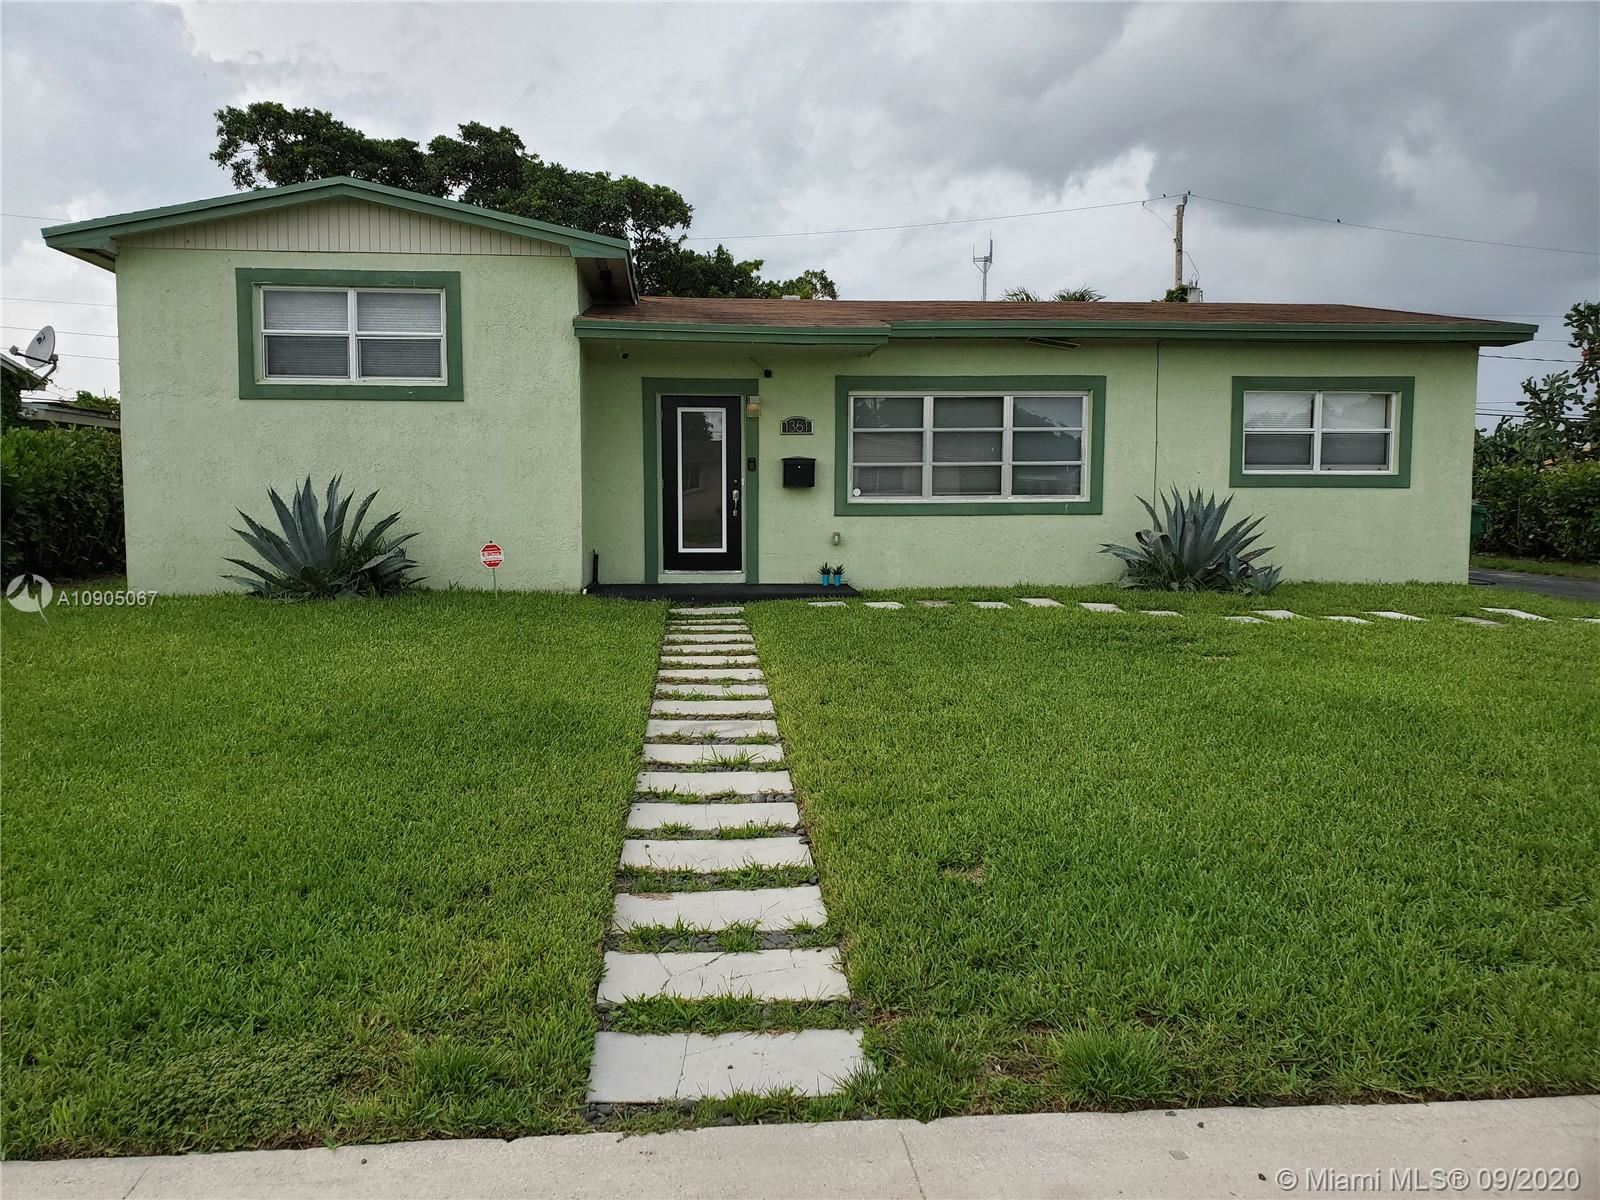 1361 NW 198th St, Miami Gardens, FL 33169 - #: A10905067